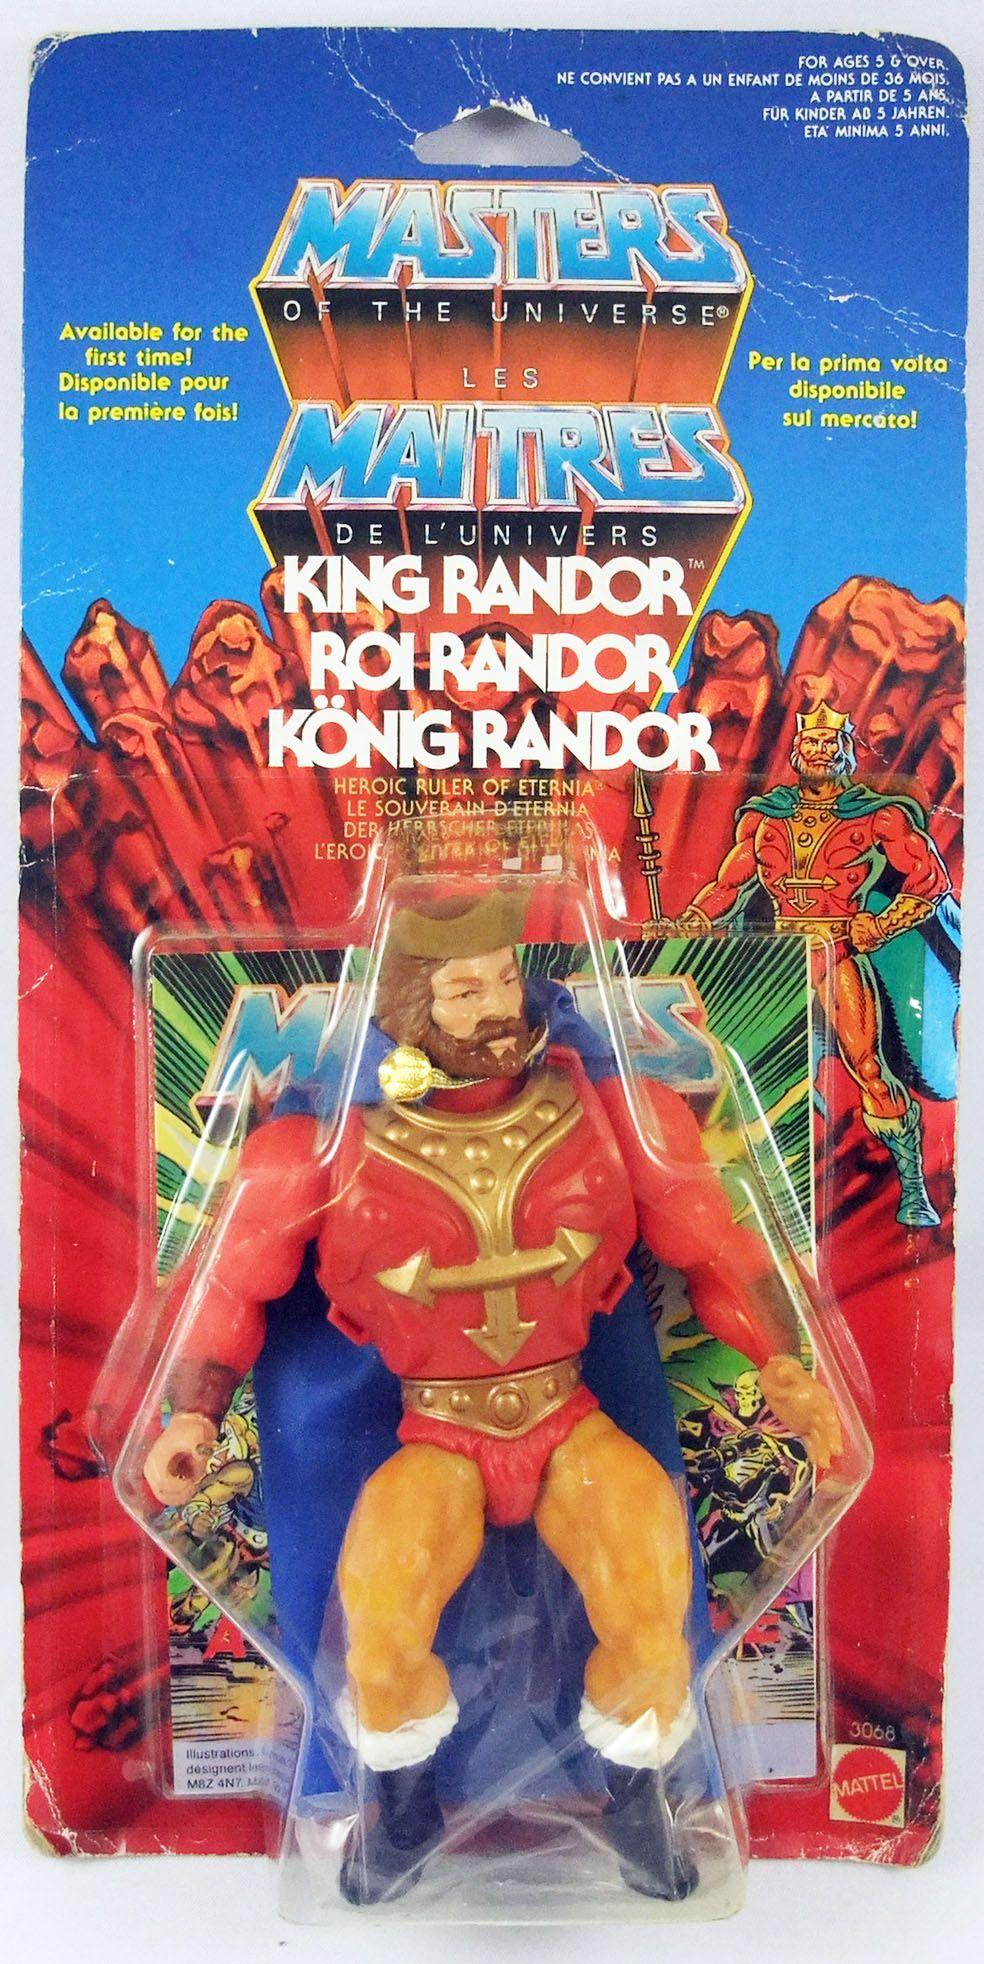 Masters of the Universe - King Randor / Roi Randor (carte Europe)